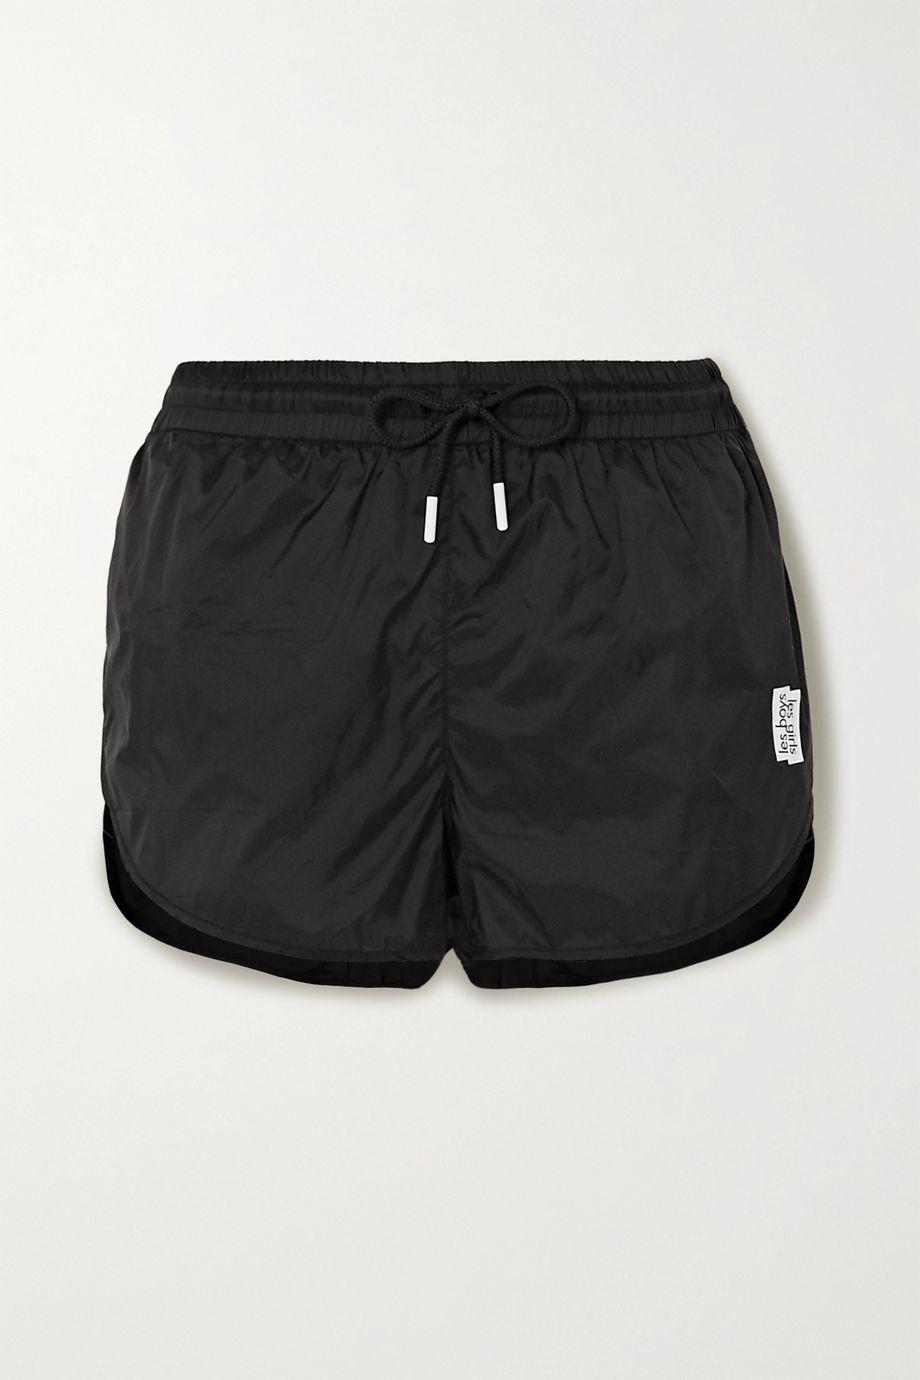 Les Girls Les Boys Printed shell shorts